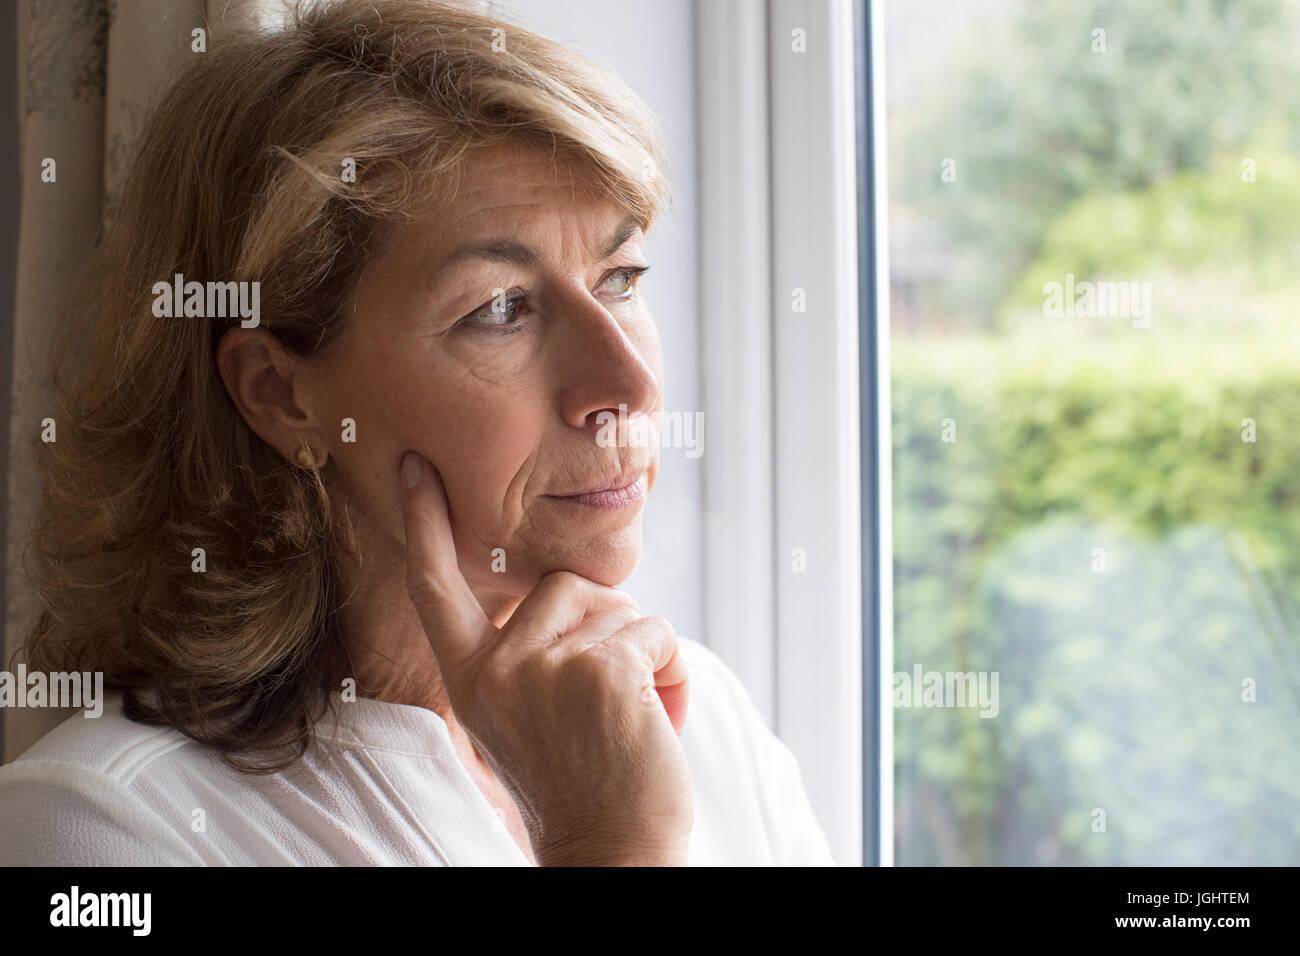 Triste mujer sufre de agorafobia mirando afuera de la ventana Imagen De Stock